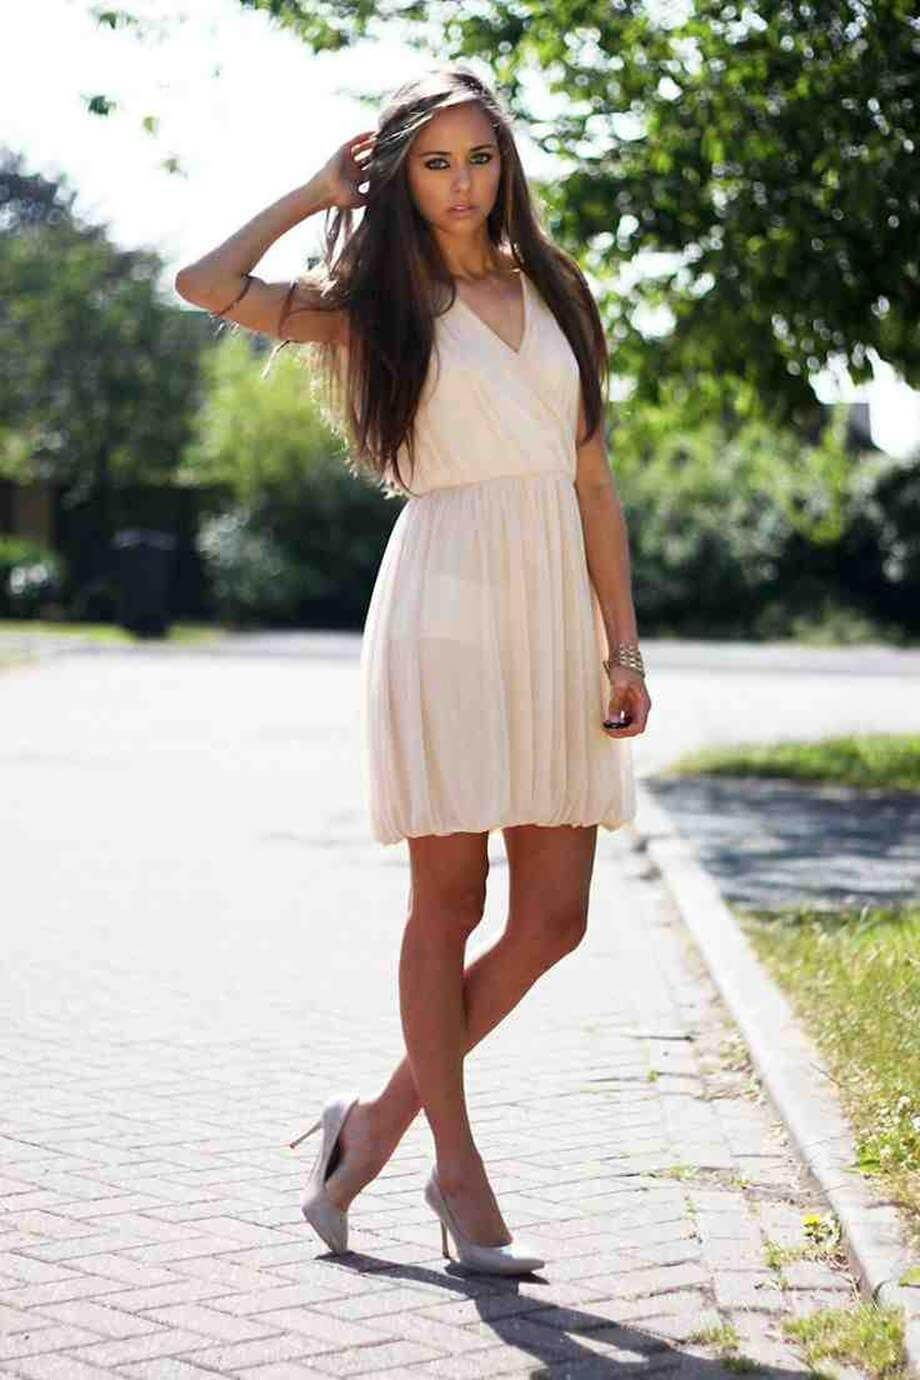 40 Beautiful Dress Ideas For Summer Wedding Guests 2020 Best Inspiration Wedding Guest Dress Summer Summer Wedding Outfits Spring Wedding Guest Dress,Vintage Style Mermaid Lace Mermaid Wedding Dresses